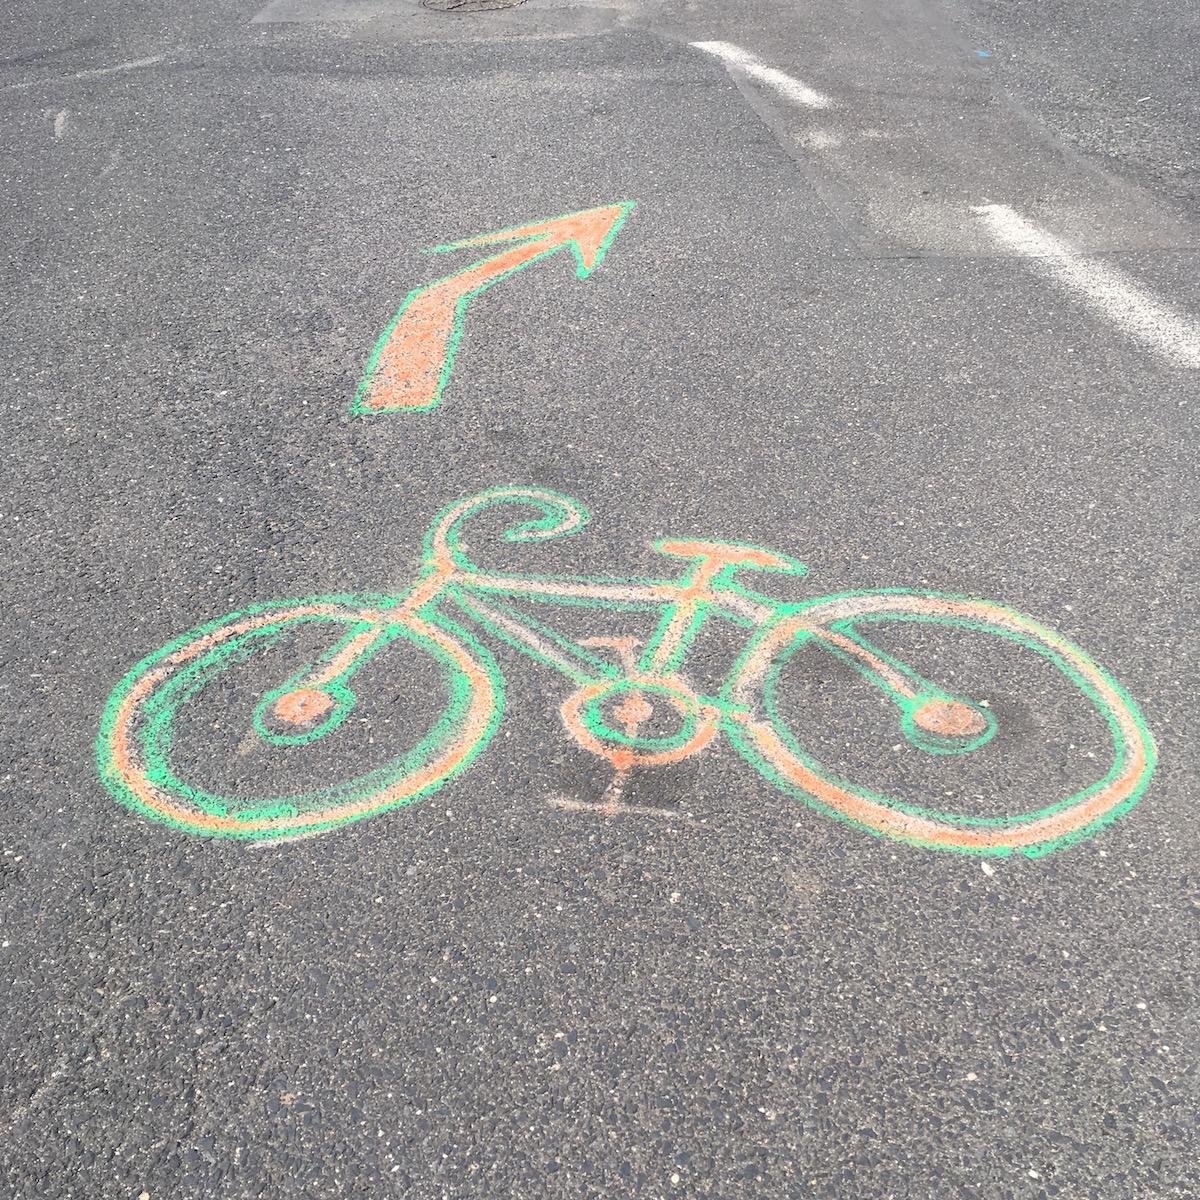 Bunte Fahrradmalereien auf der Fahrbahn